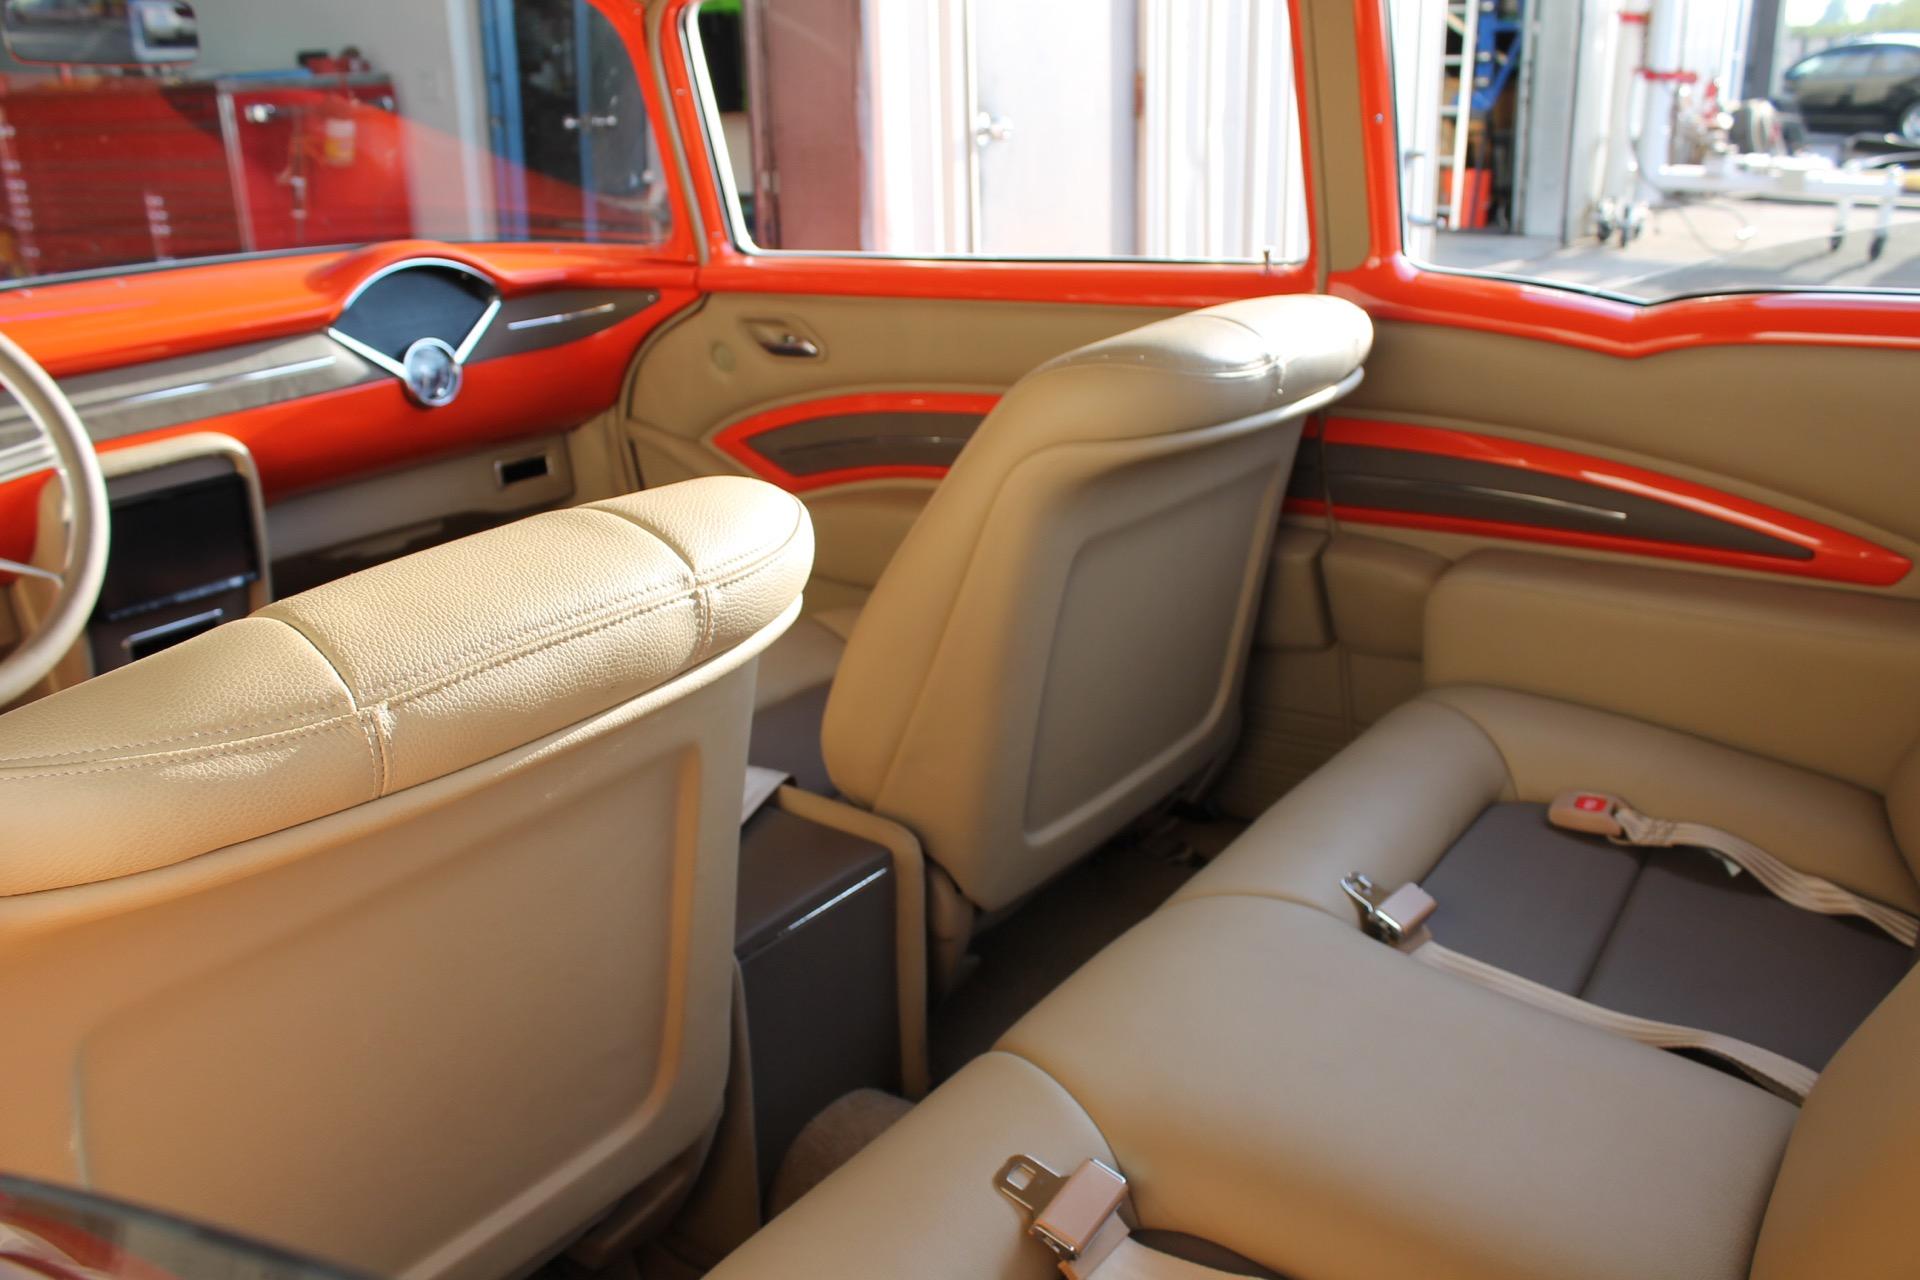 1957 Chevy Metalworks Classics Auto Restoration Speed Shop 1955 Chevrolet Fuel Tank Underbody Shots